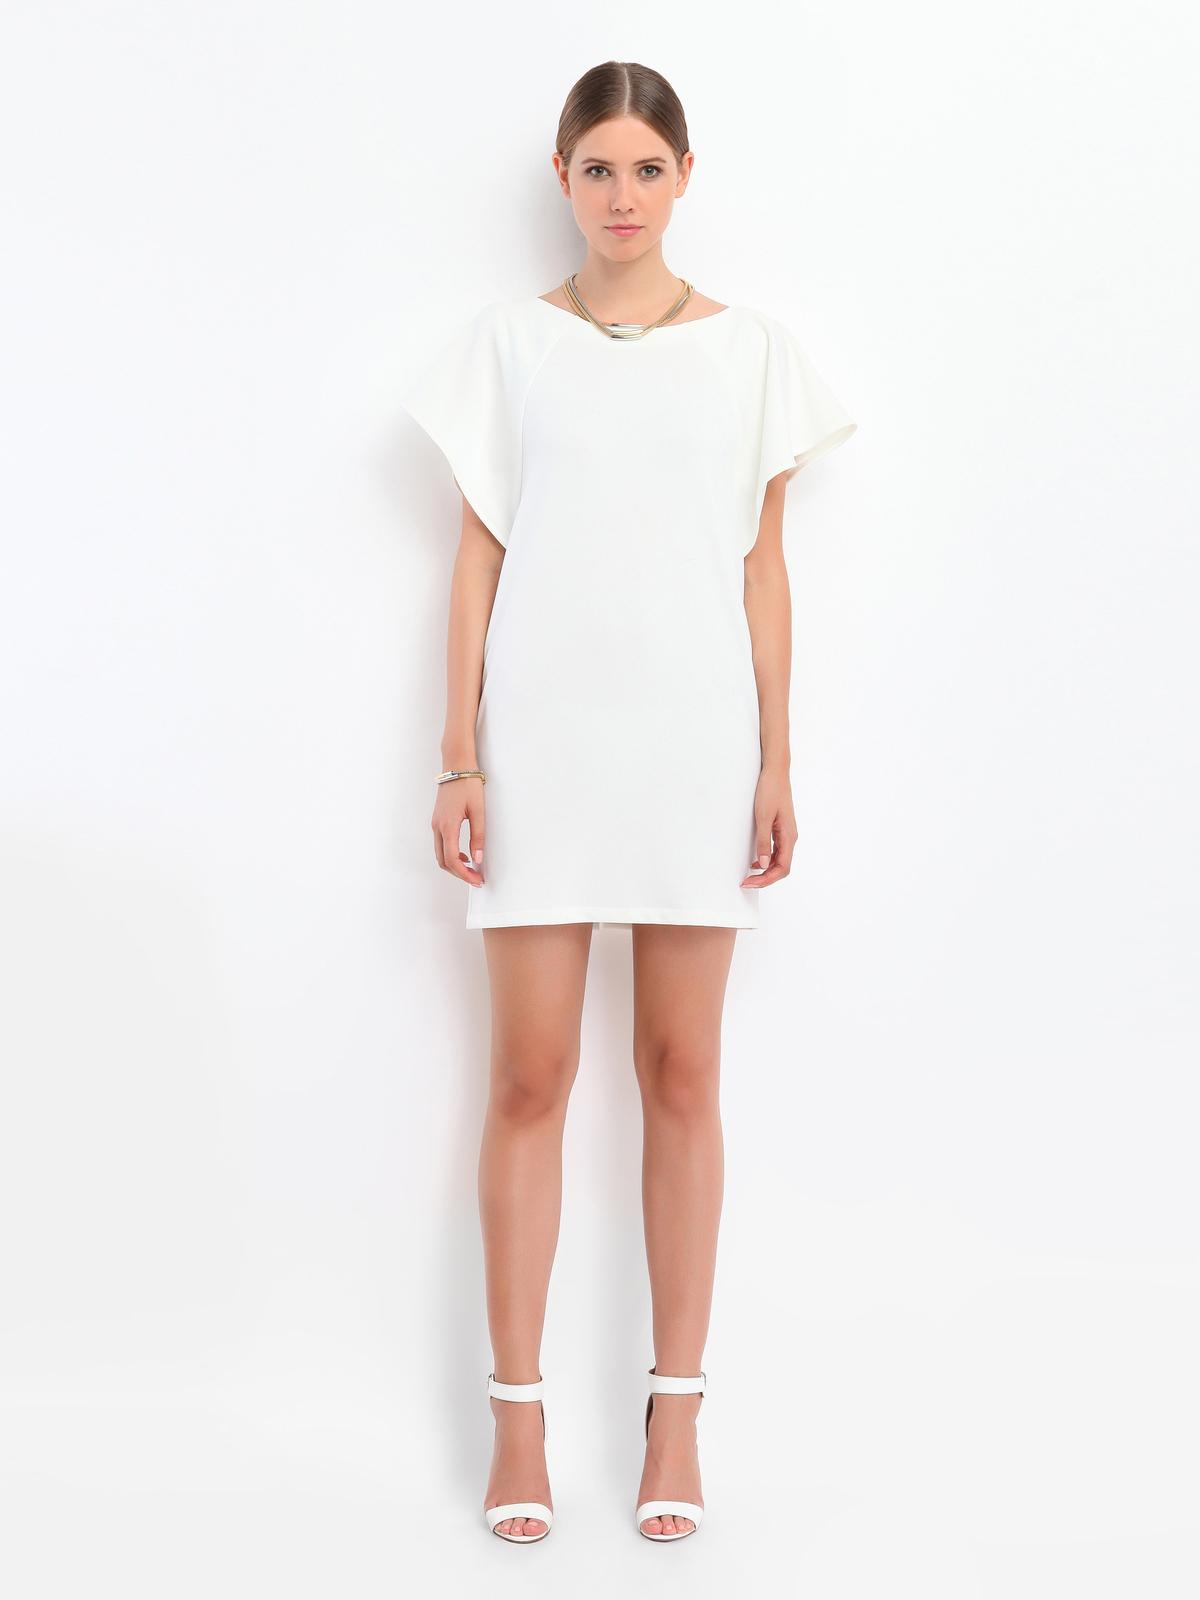 e058982b411 Blog - Τι να φορέσω στον γάμο: 10 φορέματα (που δείχνουν ακριβότερα…)